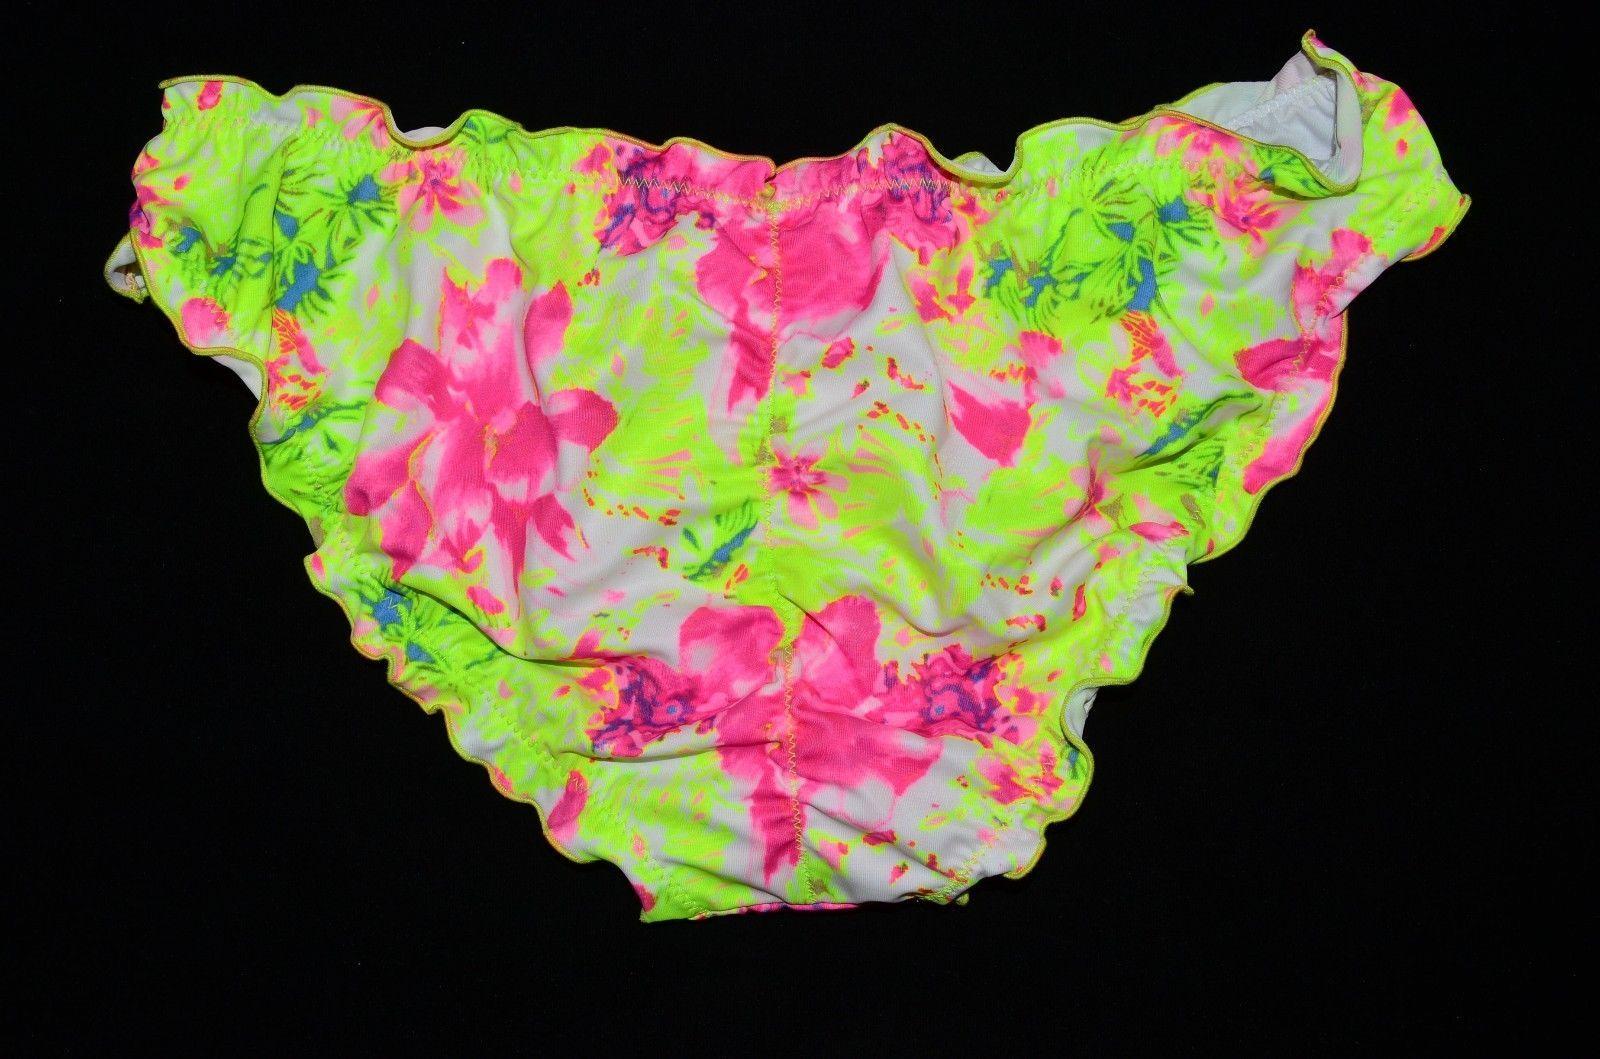 MALIA Green Pink Floral Cheeky Ruched Ruffle Bikini Bottom Small S NEW Victoria